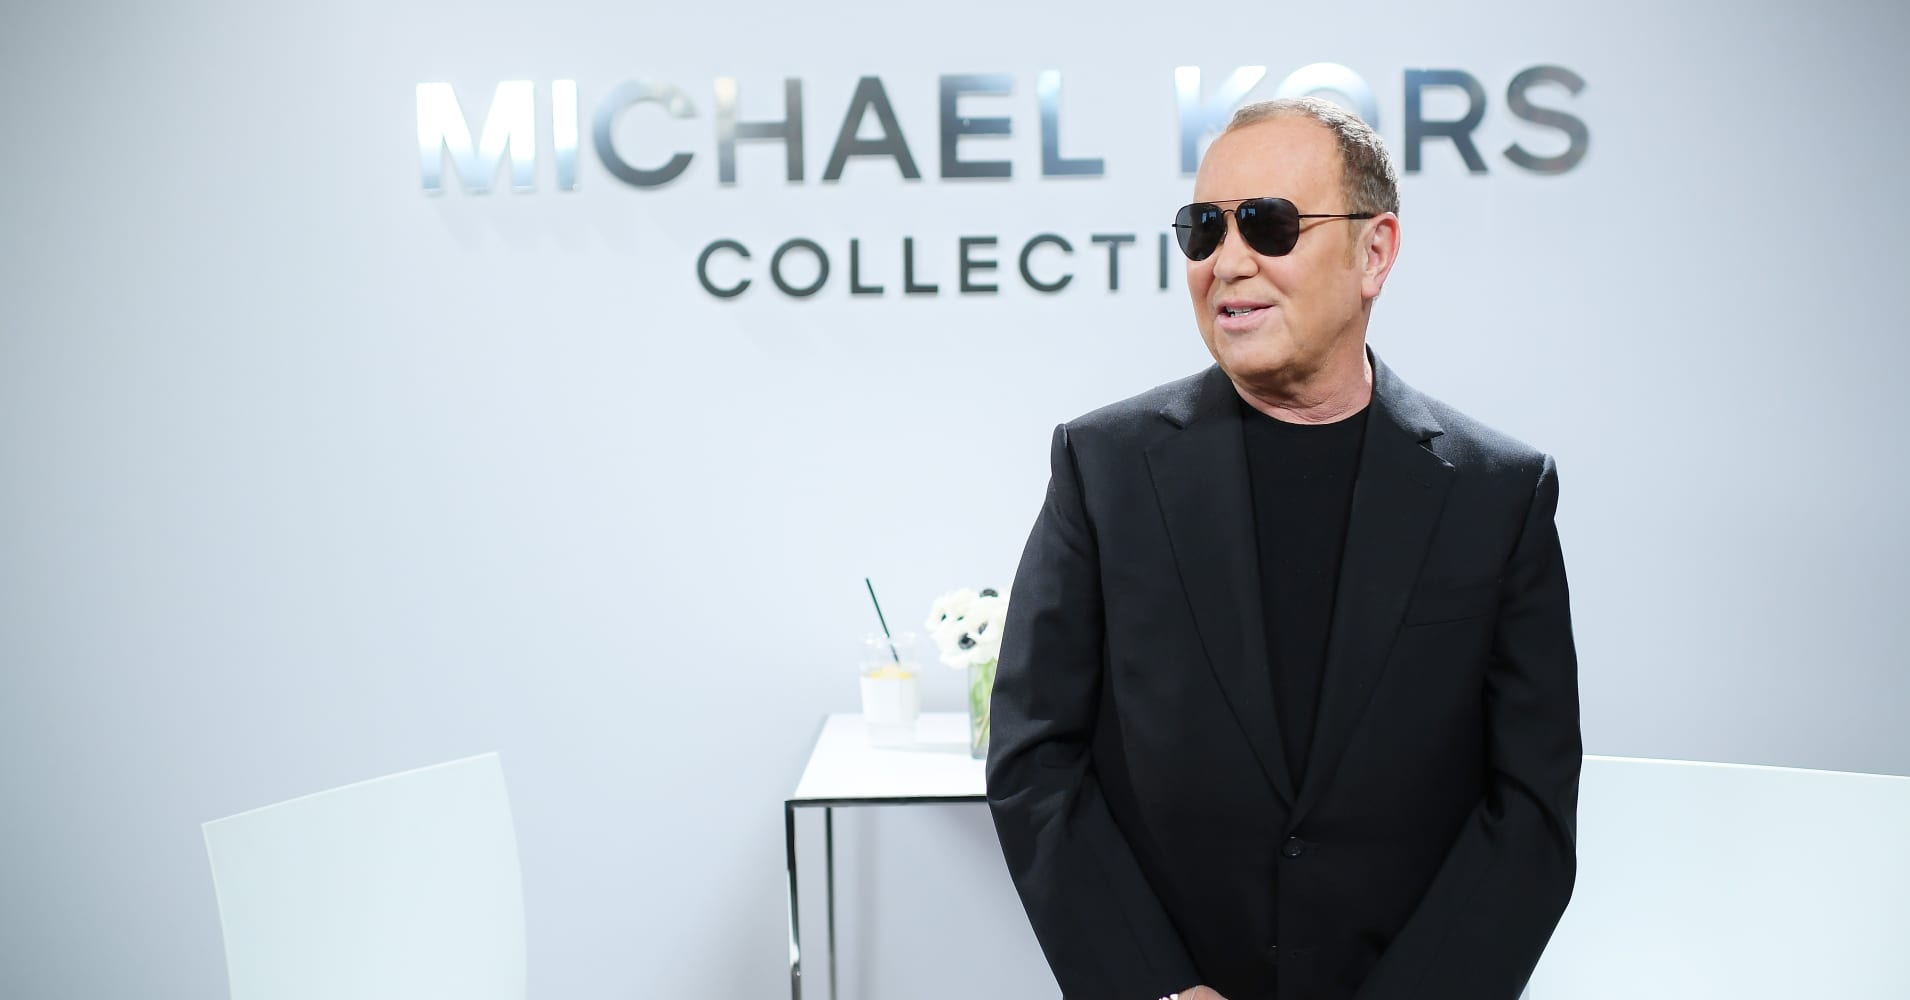 48d14072aa Michael Kors to buy Versace and change name to Capri Holdings